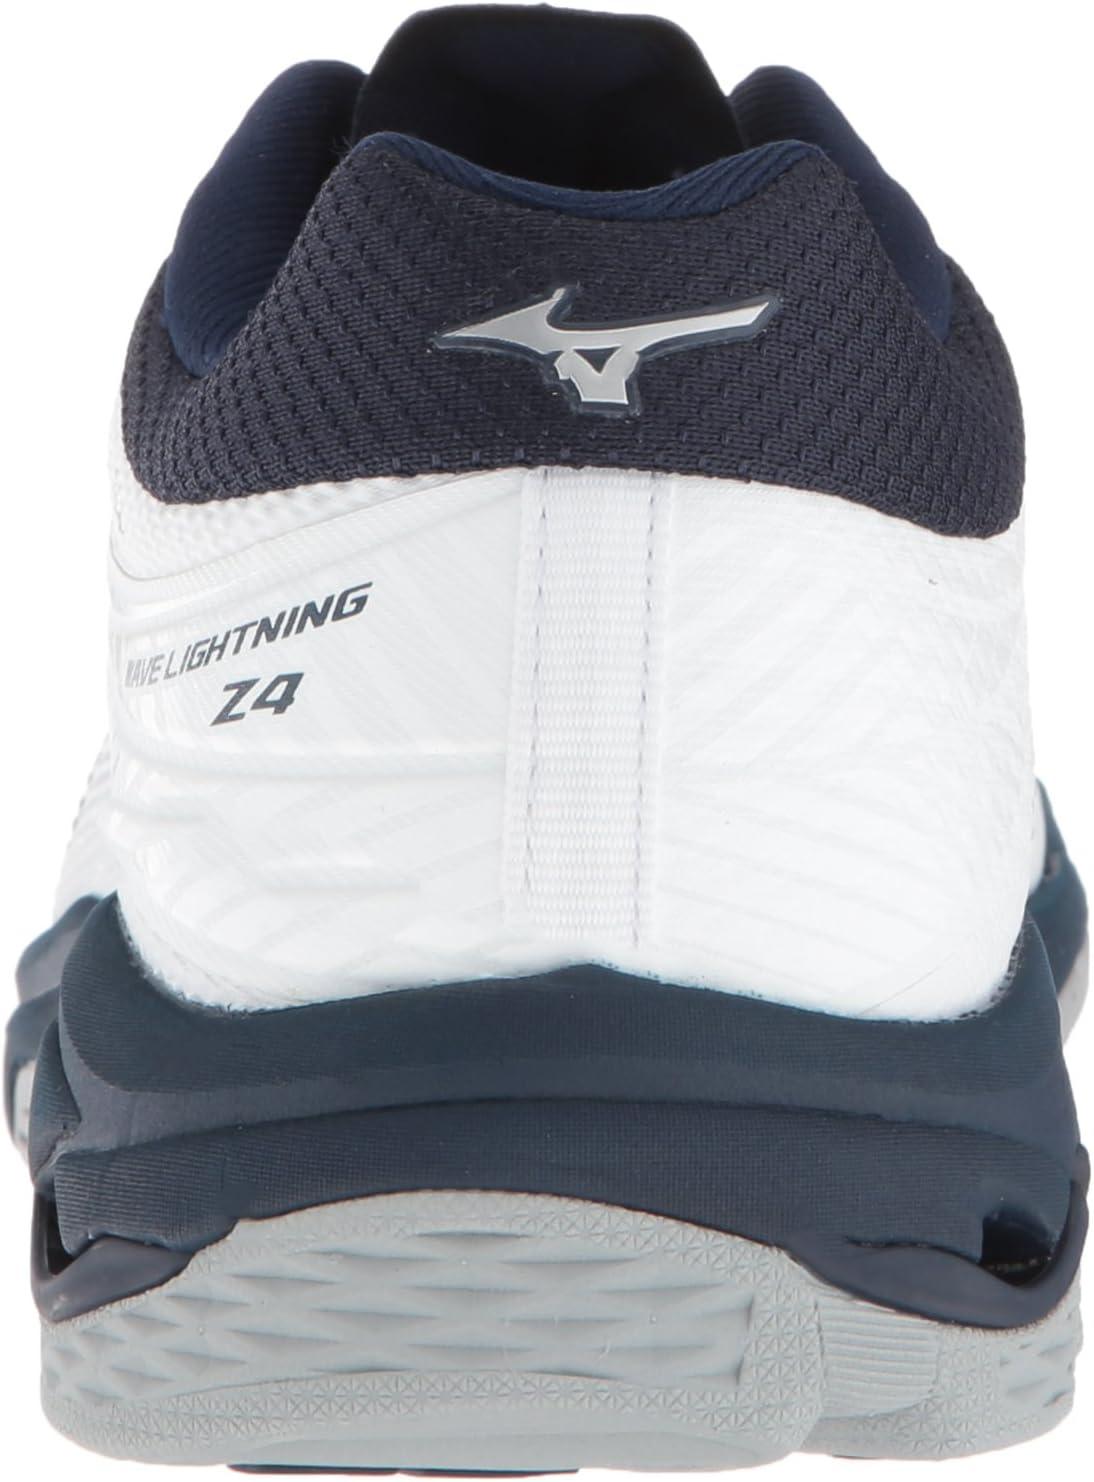 Mizuno Wave Lightning Z4 Volleyball Shoes Footwear Womens